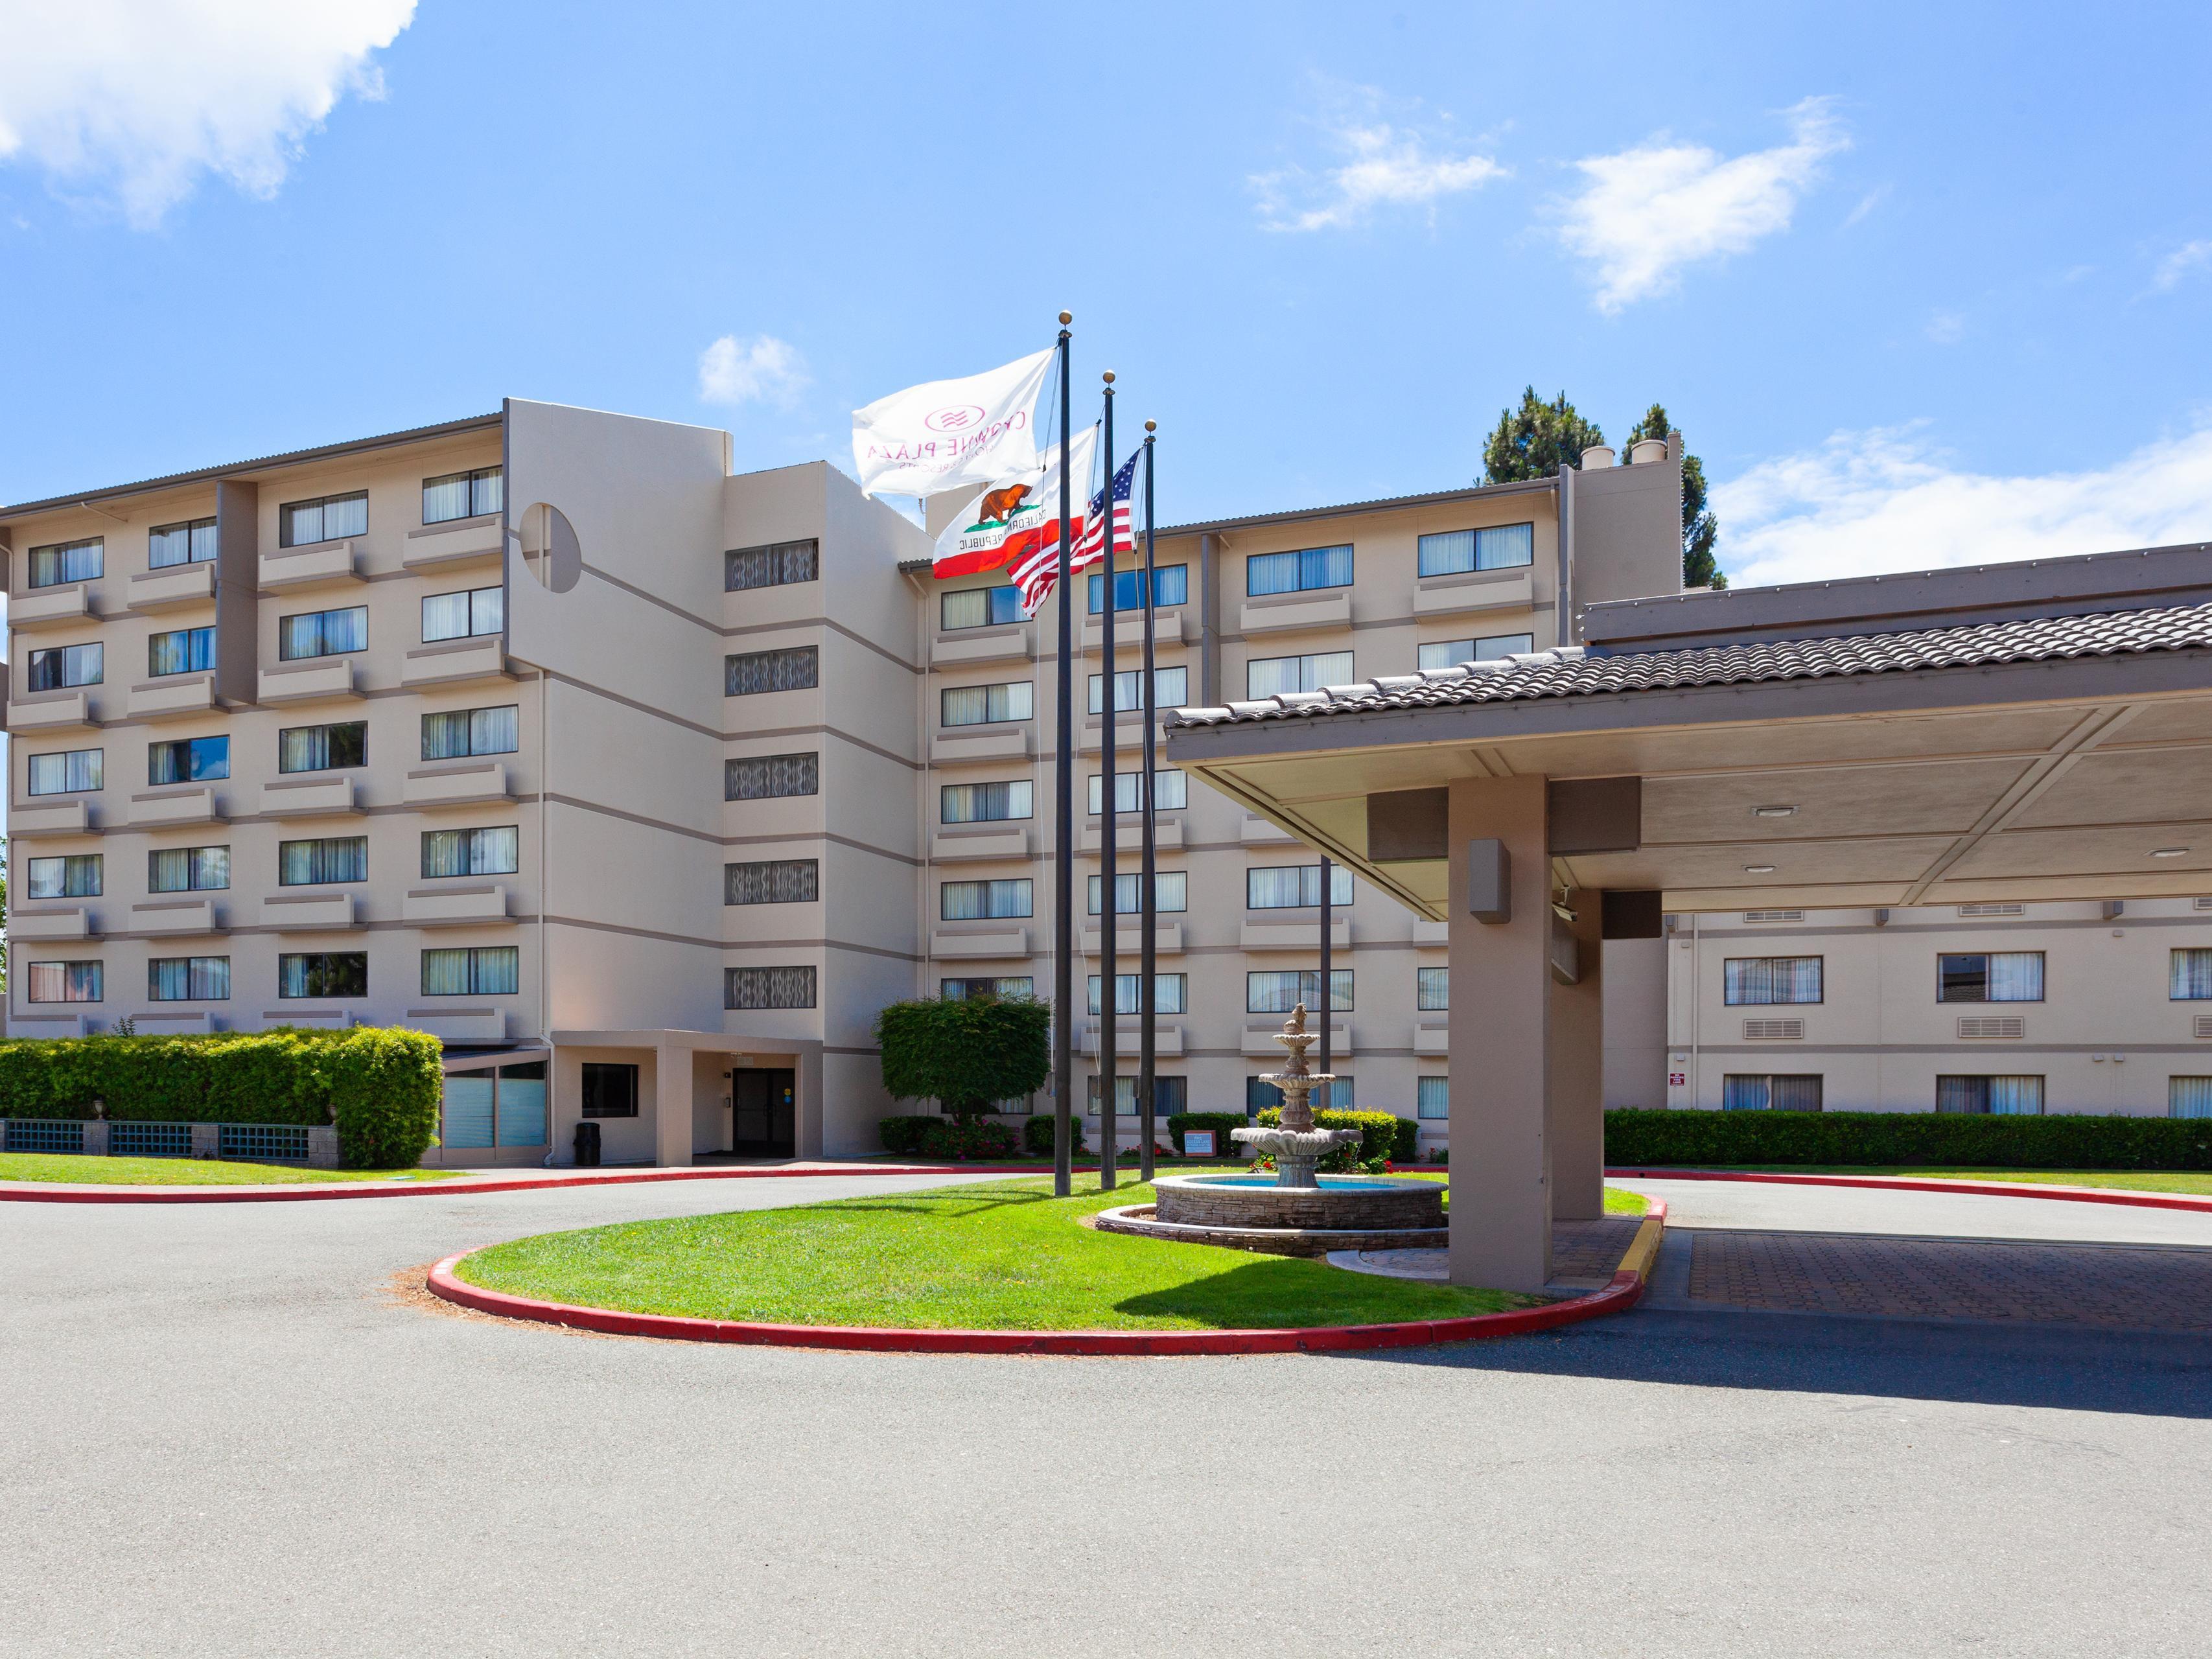 Holiday Inn Express San Francisco Hotels | Budget Hotels in San